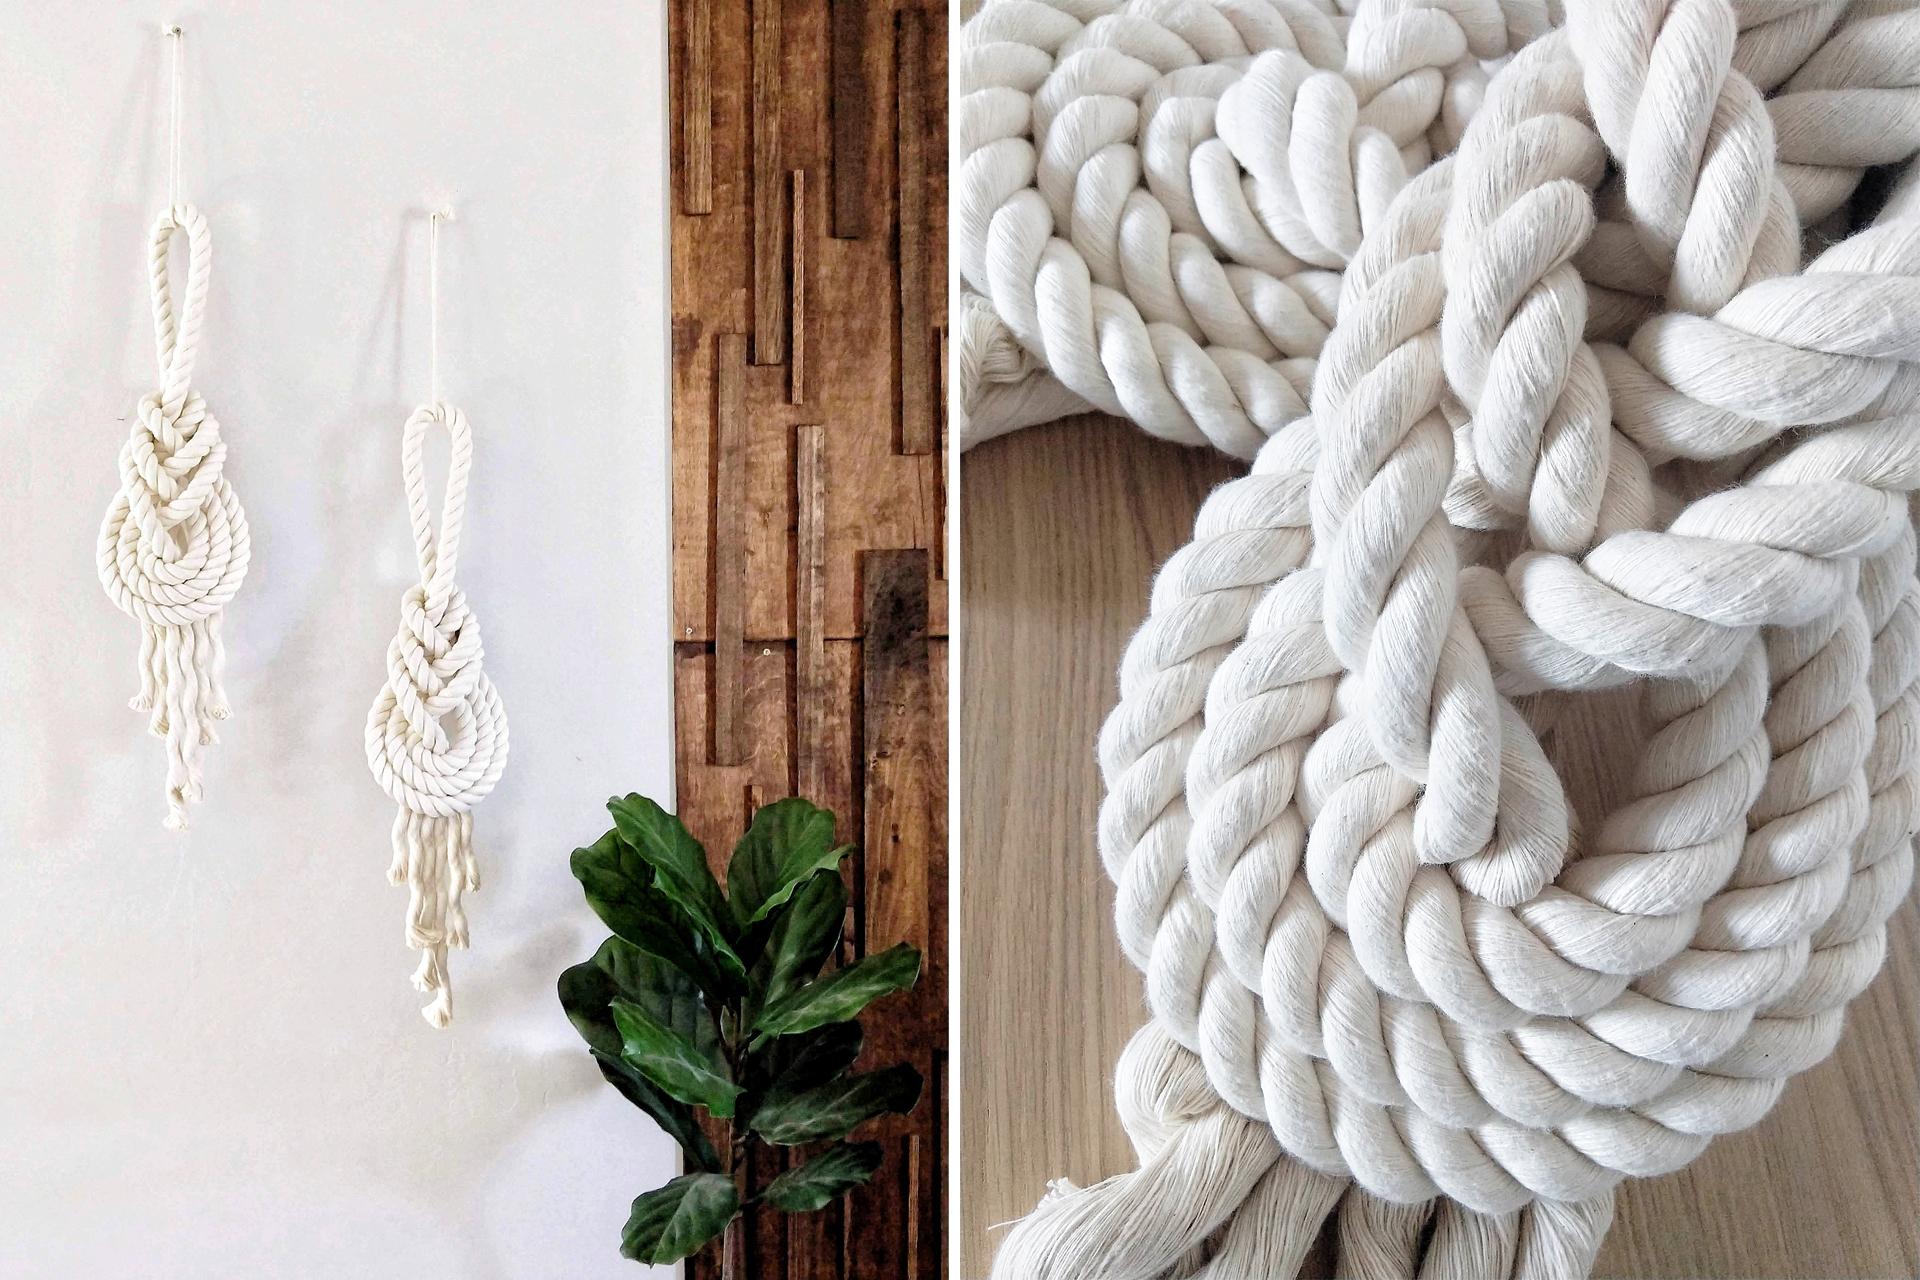 Damaris Kovach Knit A Therapy 2.jpg